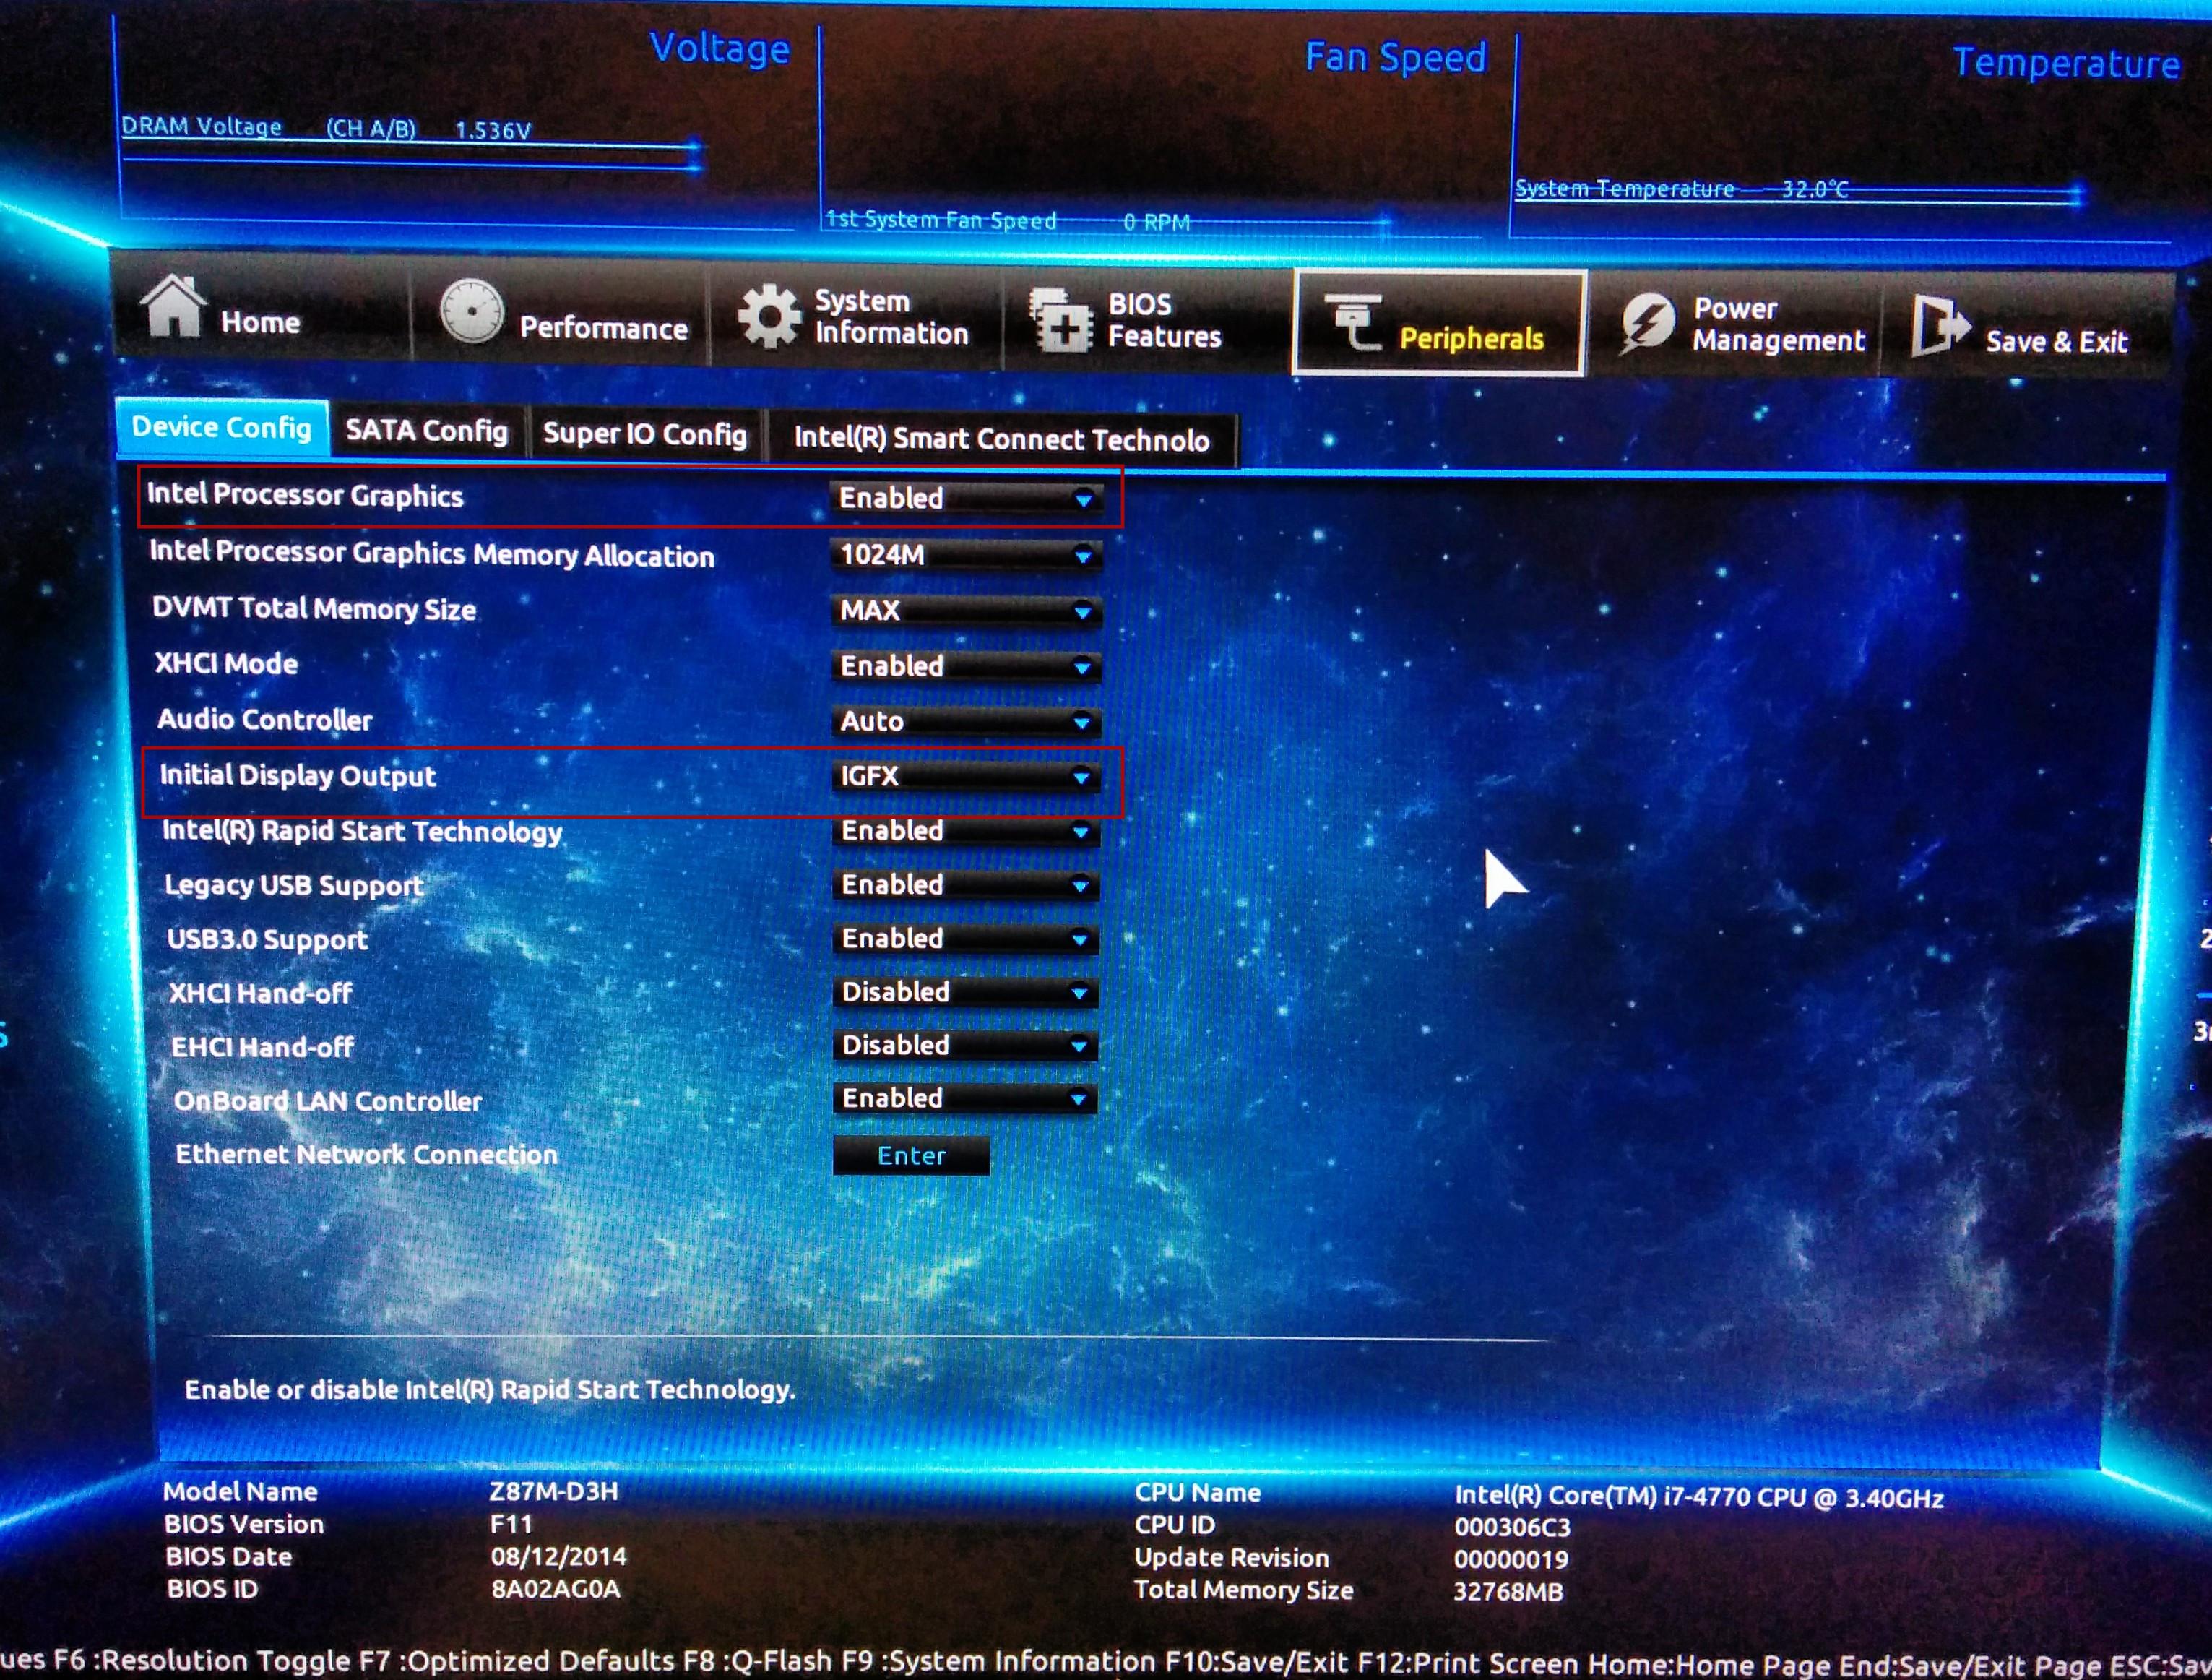 Attachment 135426 Details for Bug 103678 – case 1 (Intel